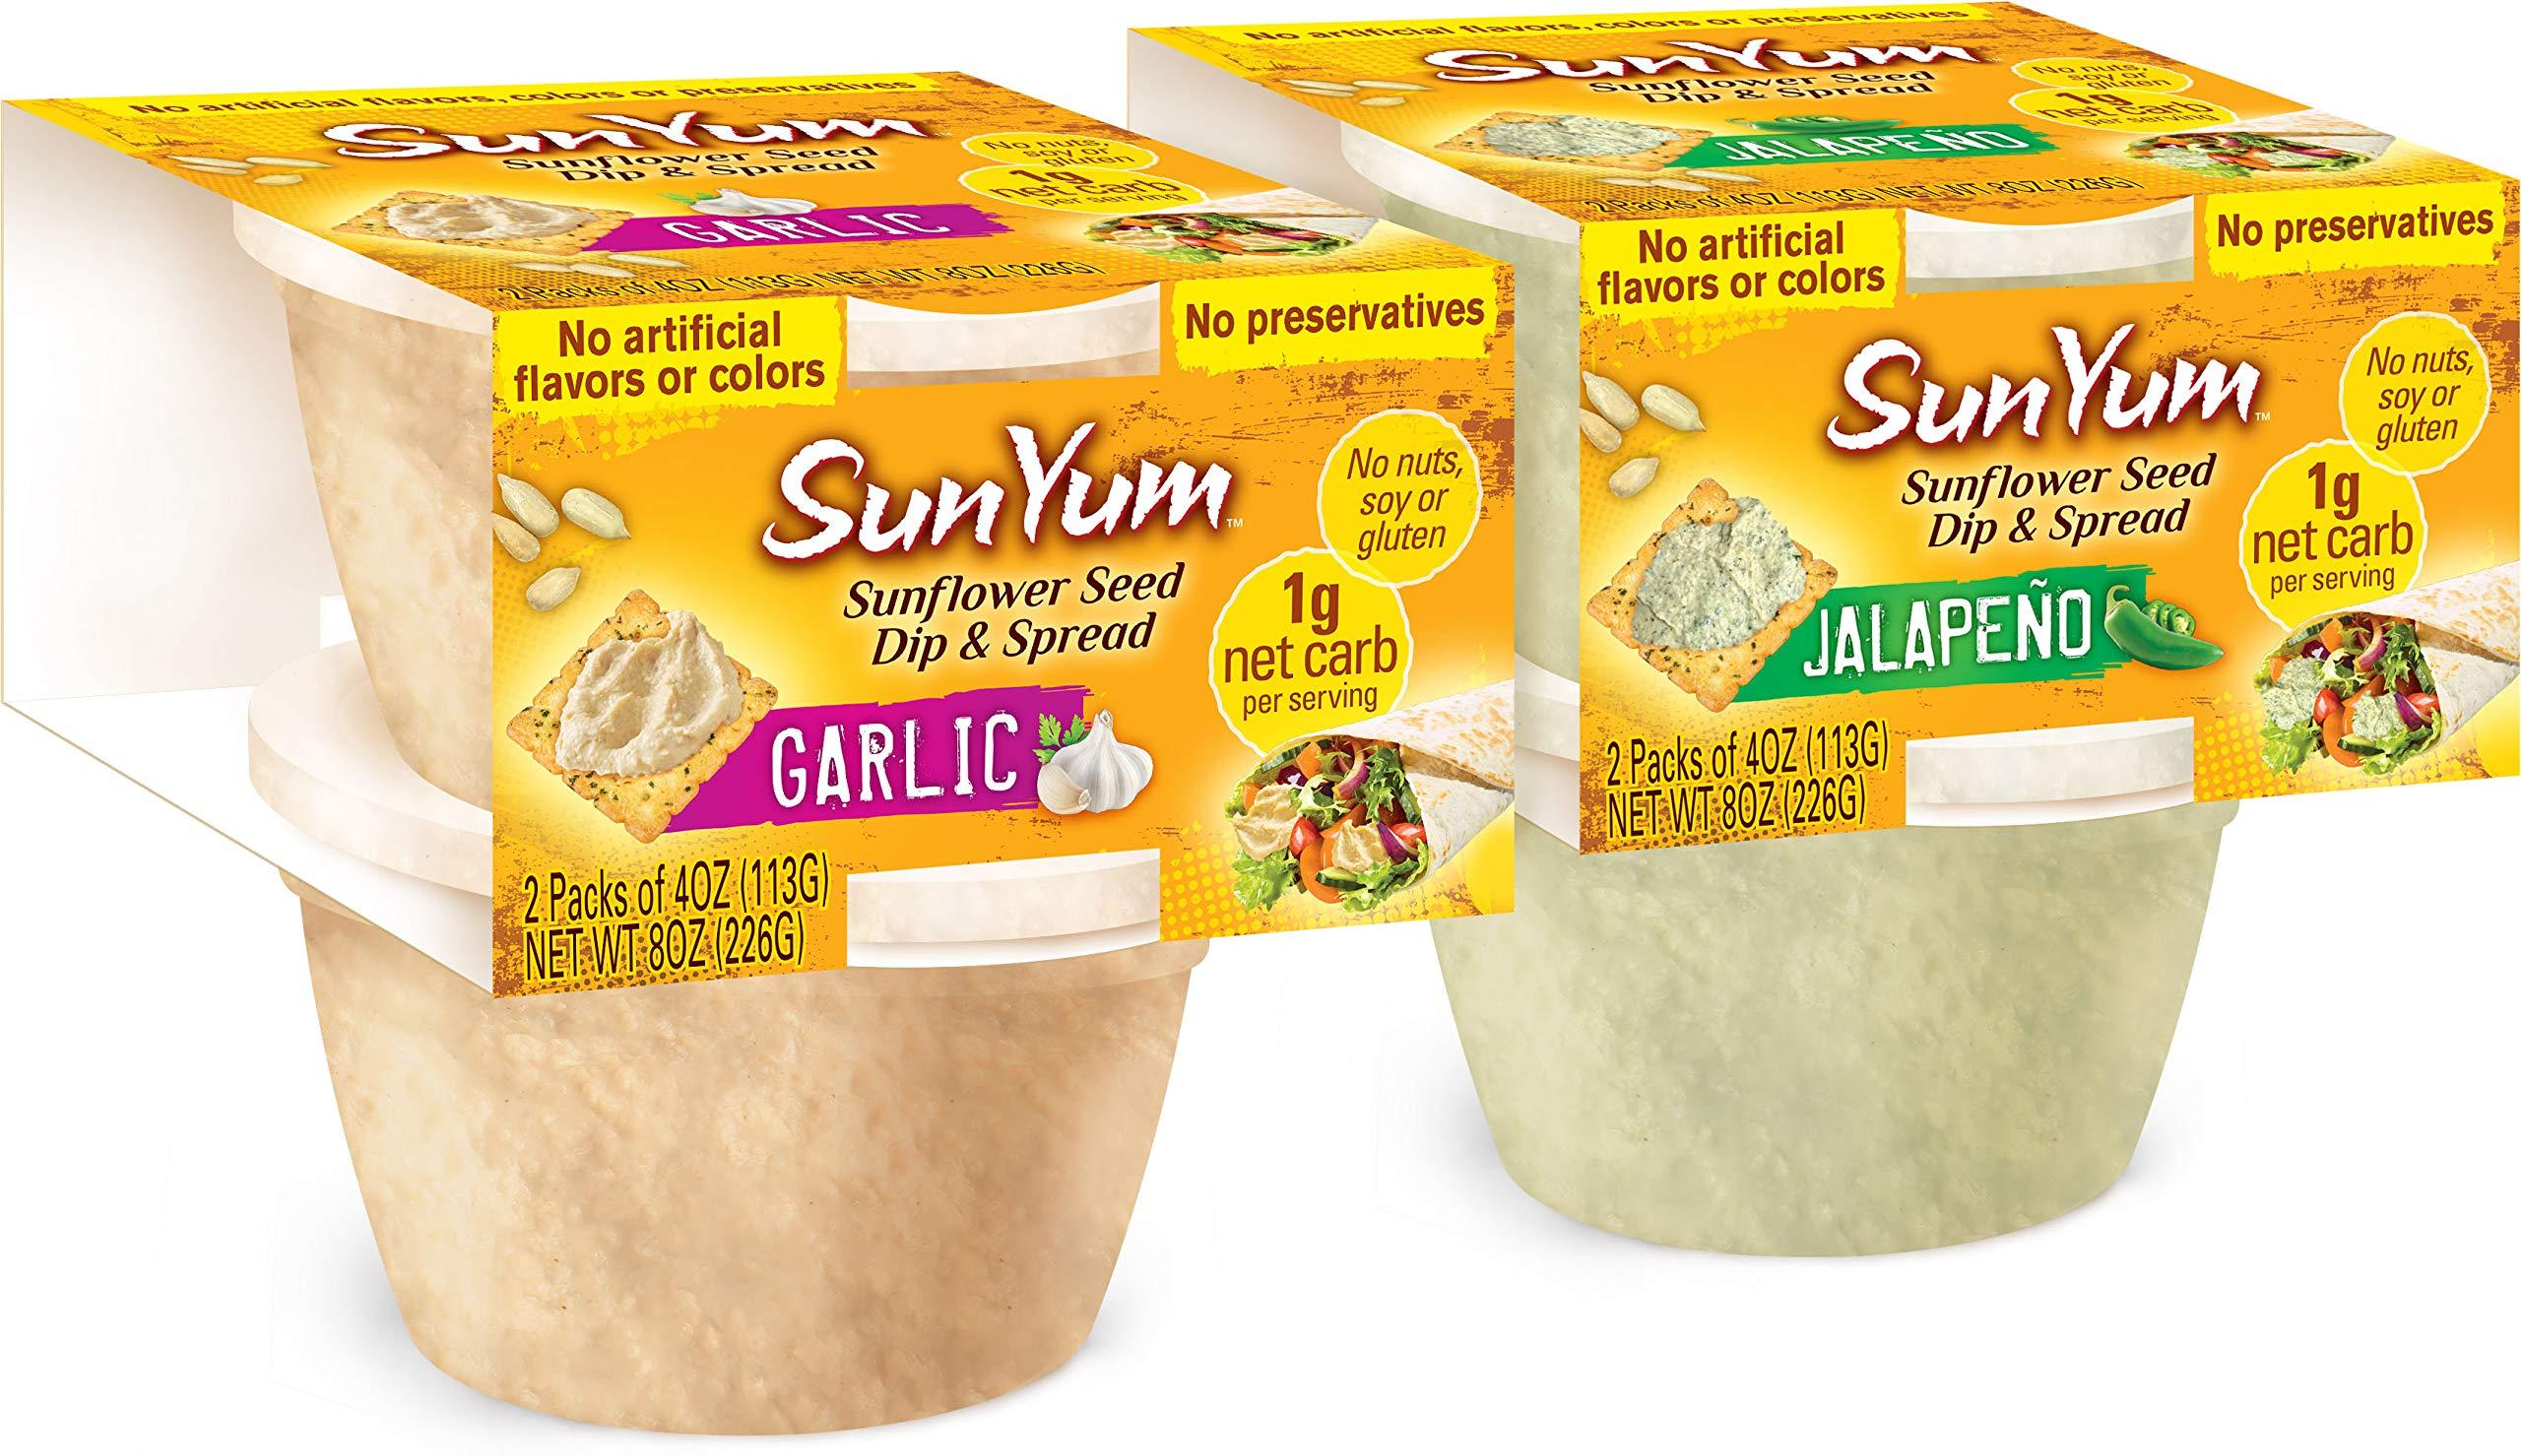 SunYum Sunflower Seed Dip & Spread - Low Carb Hummus Alternative - Keto Snacks, 2 Packs - 4 Cups (Mixed)